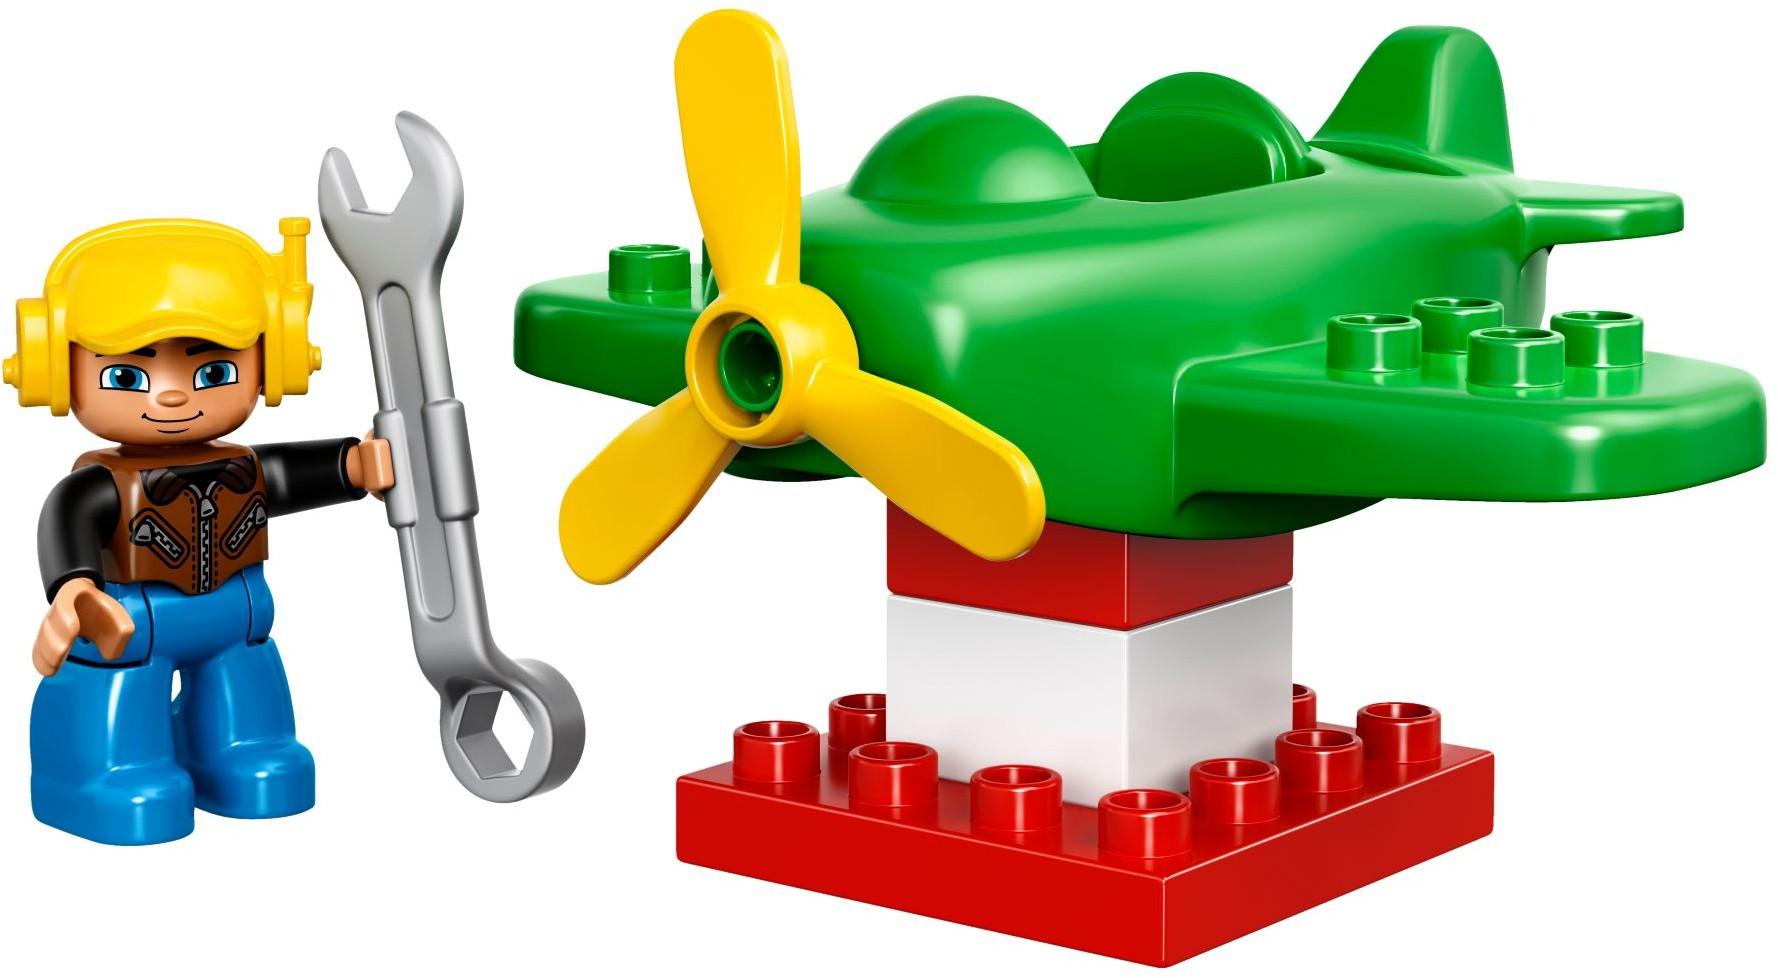 10808 Mały Samolot Little Plane Klocki Lego Duplo Lego Duplo